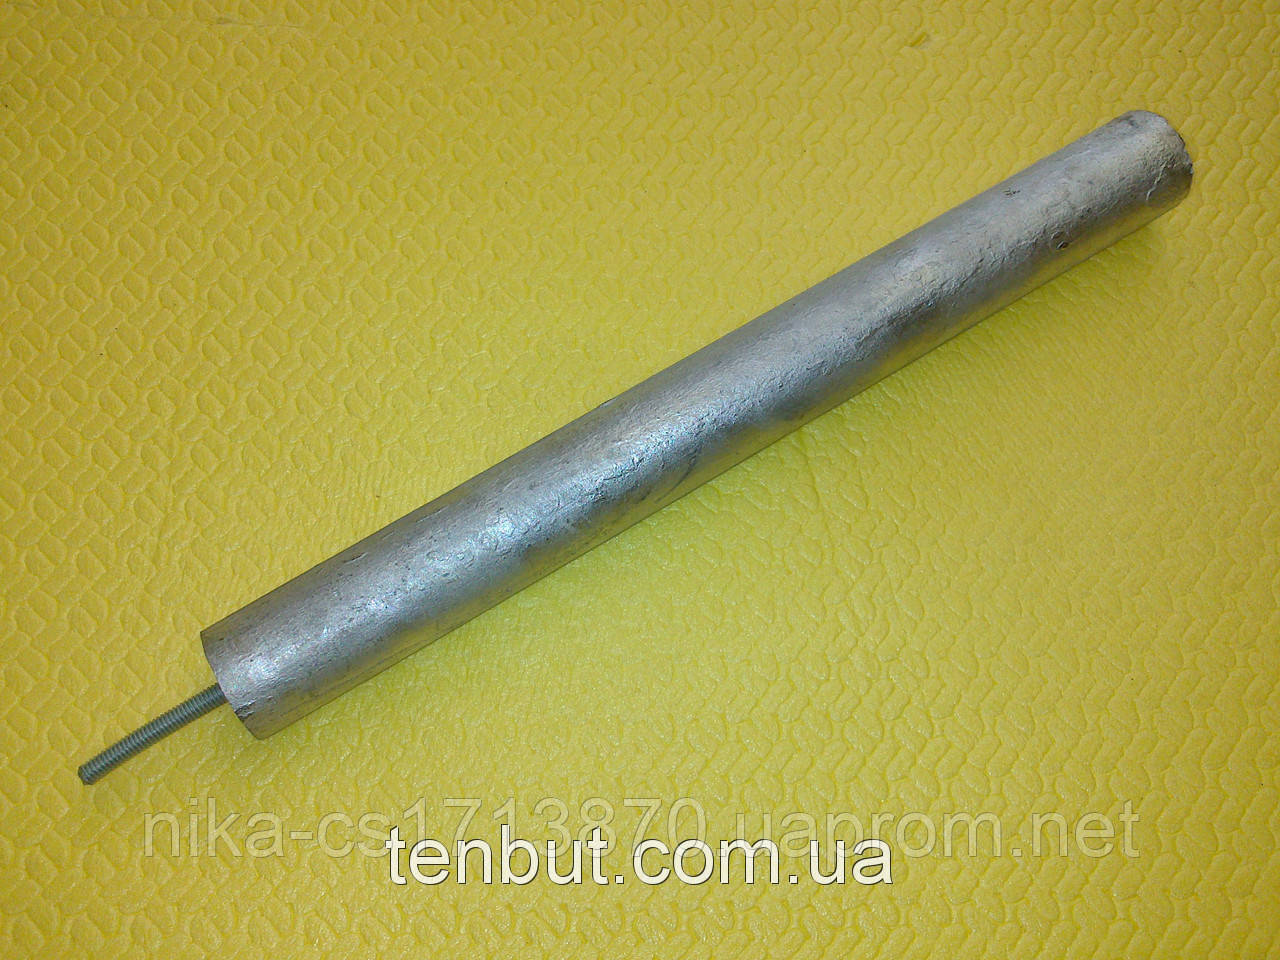 Магниевый анод Украина м8/D25/L200 мм. На короткой шпильке.